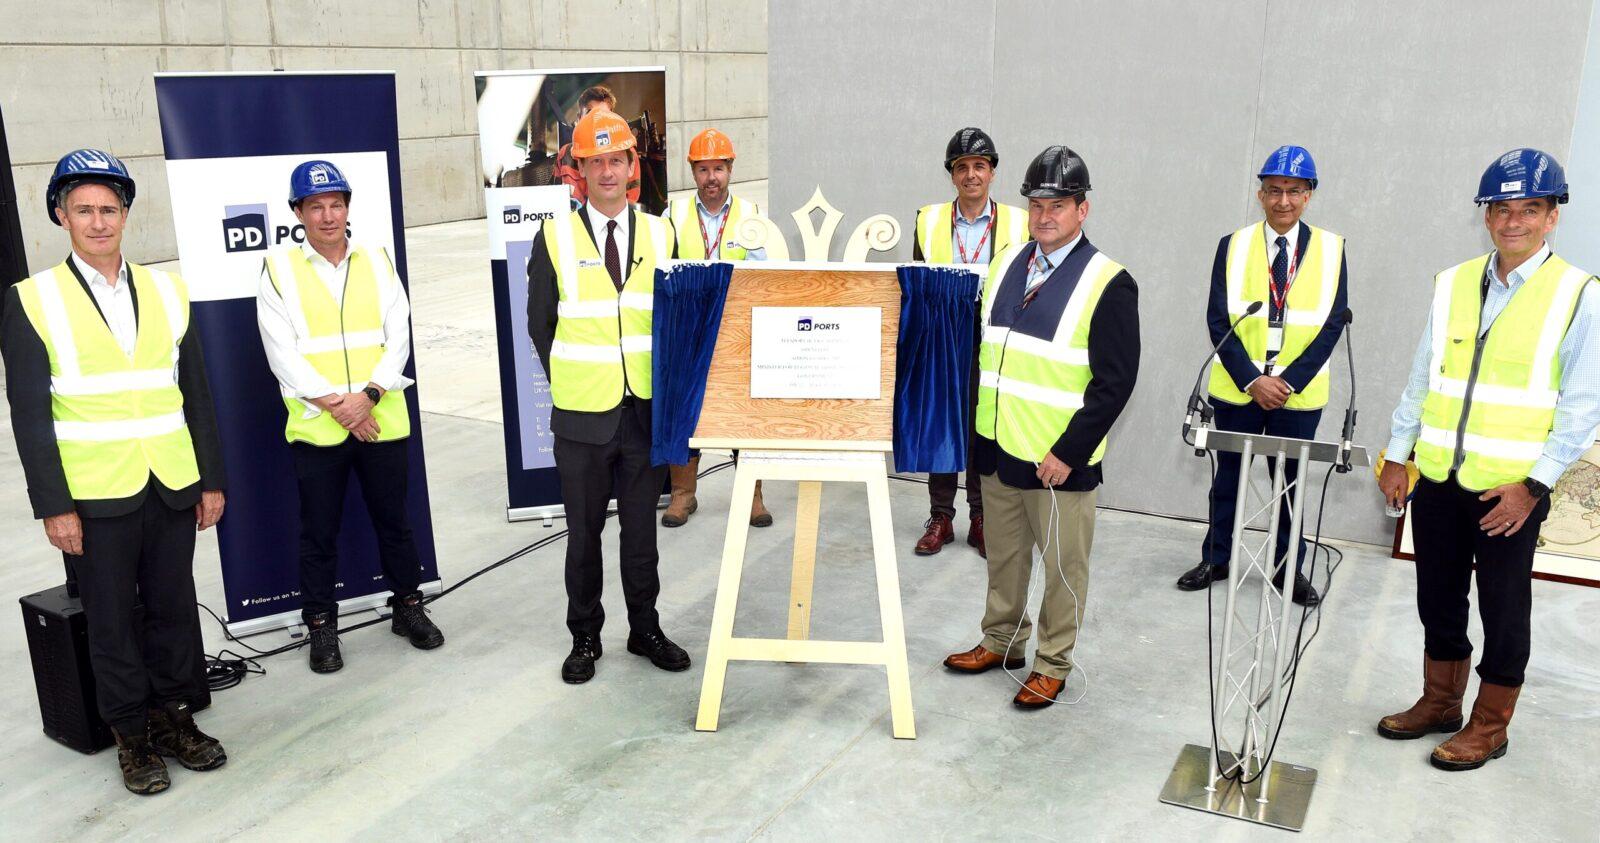 Minister opens multi-million pound bulks terminal at Teesport